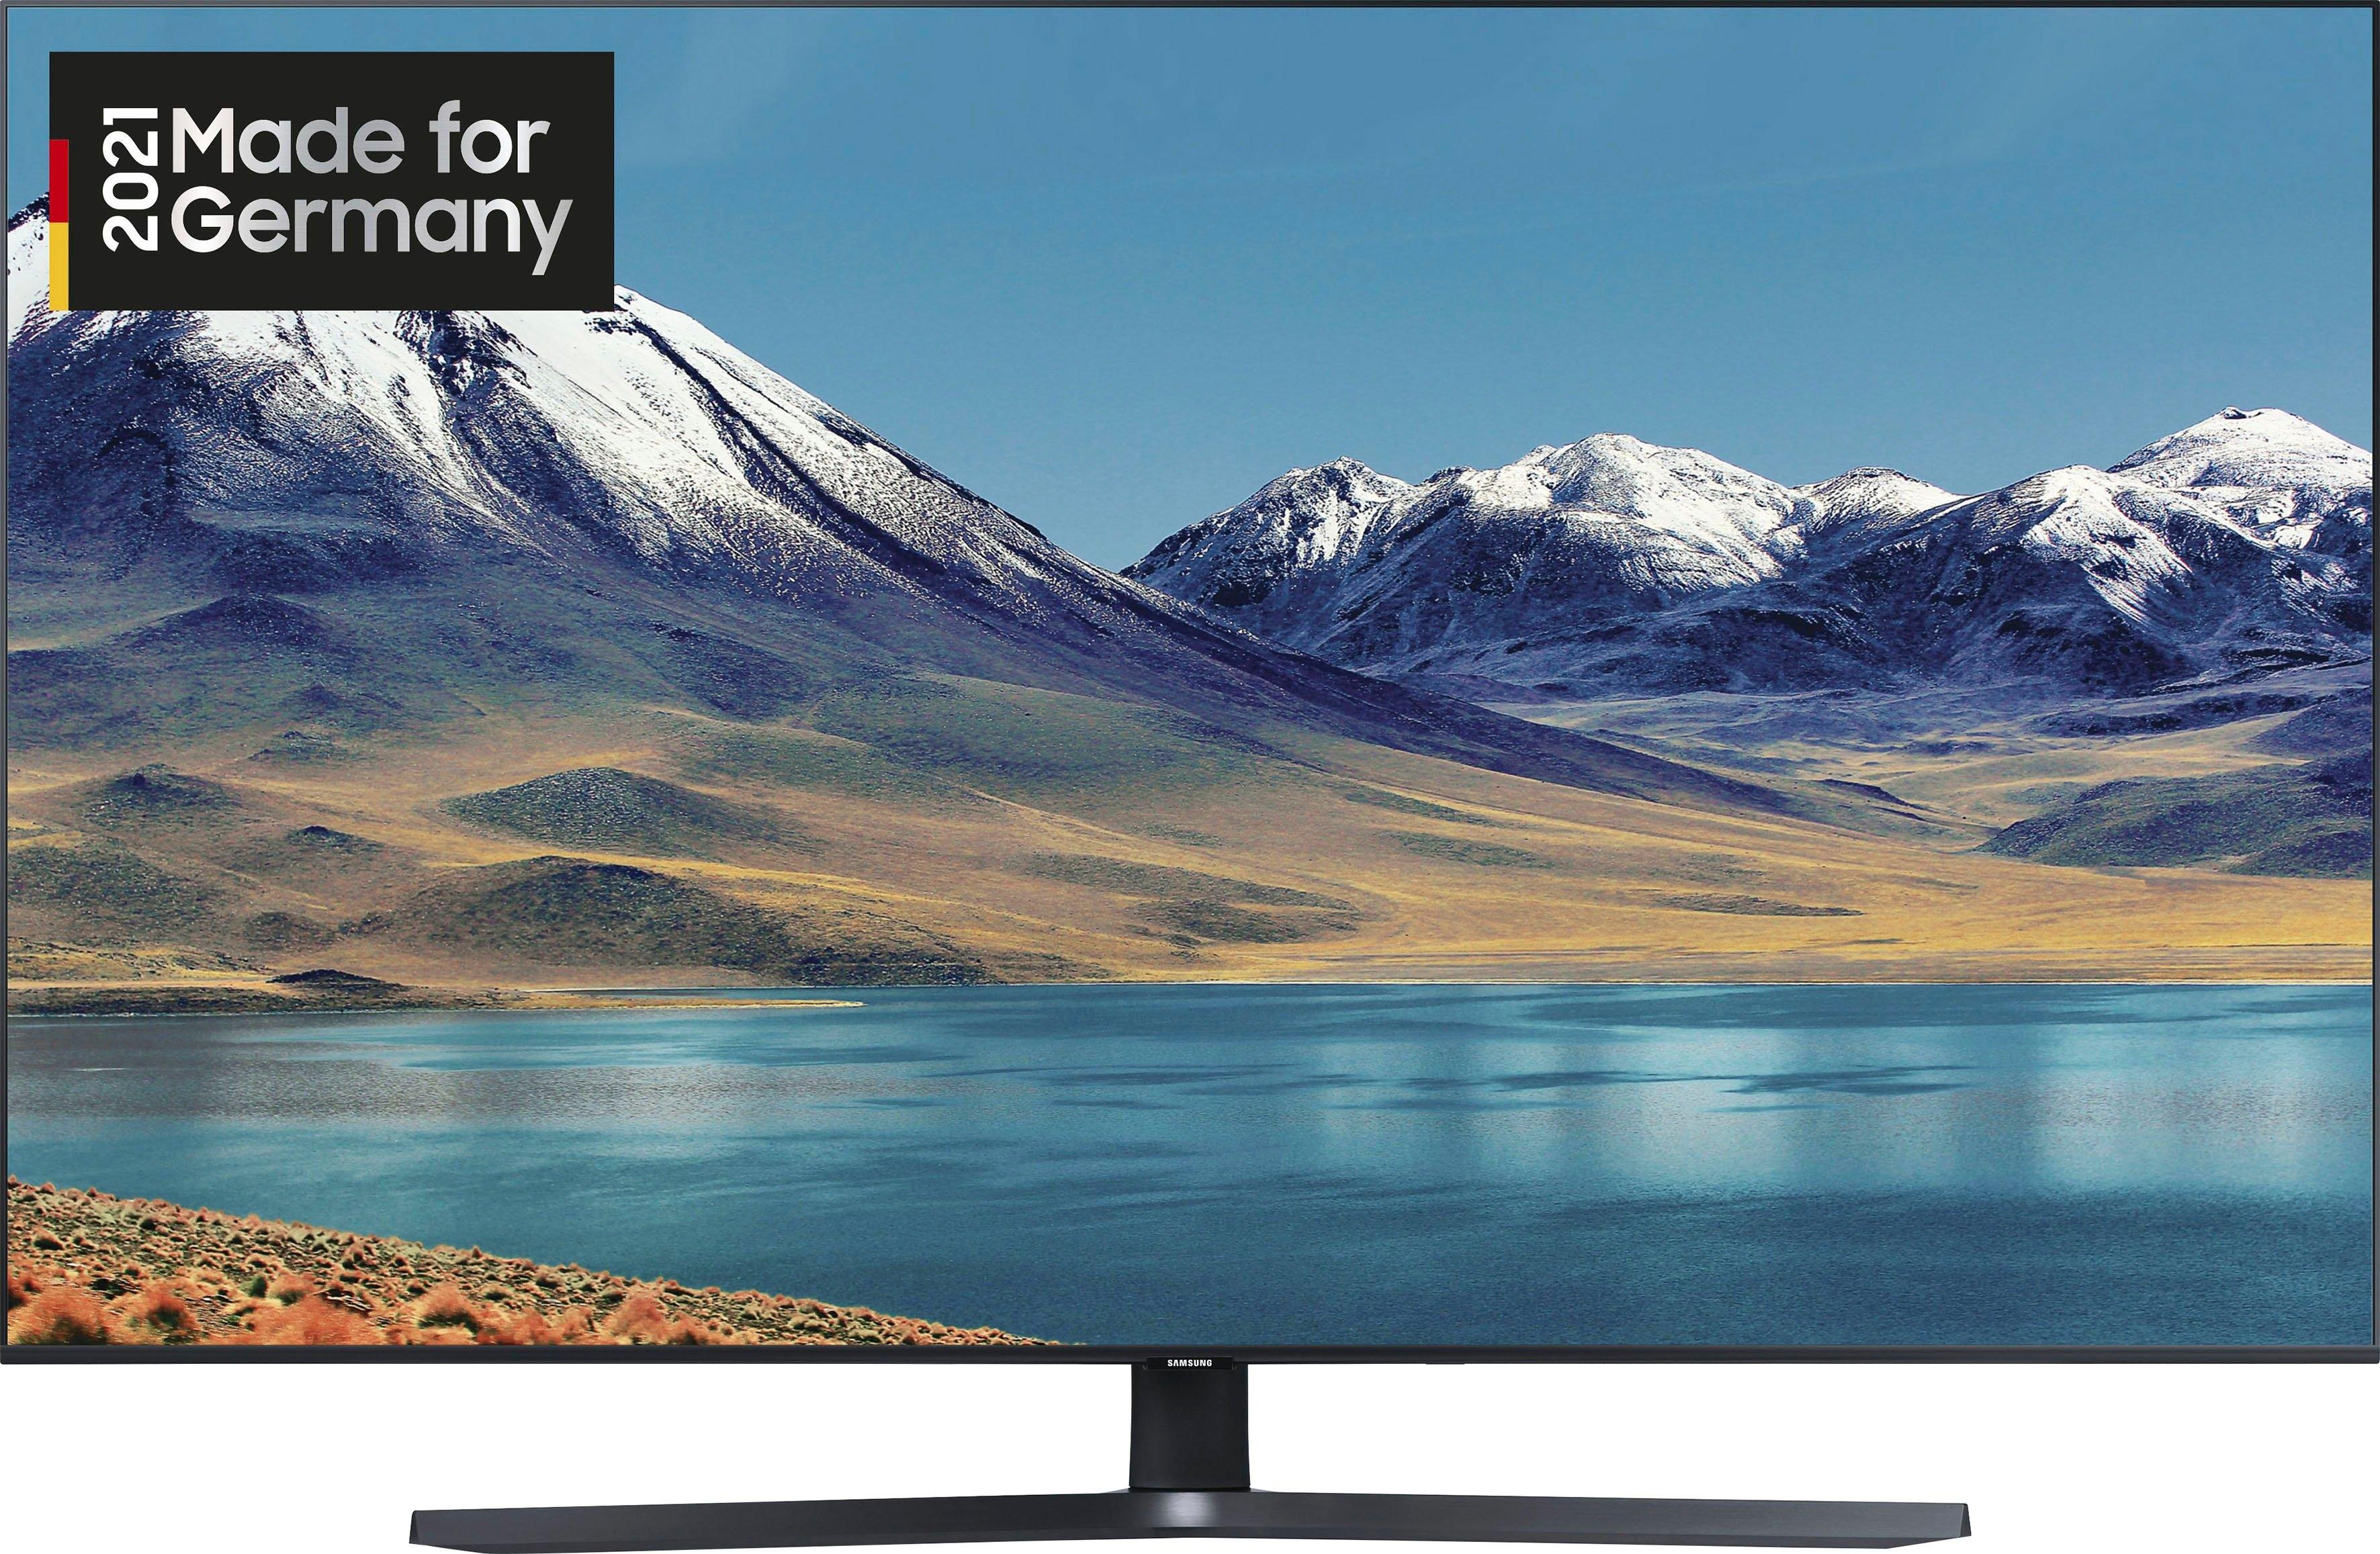 Samsung LED-TV GU65TU8509U, 163 cm / 65